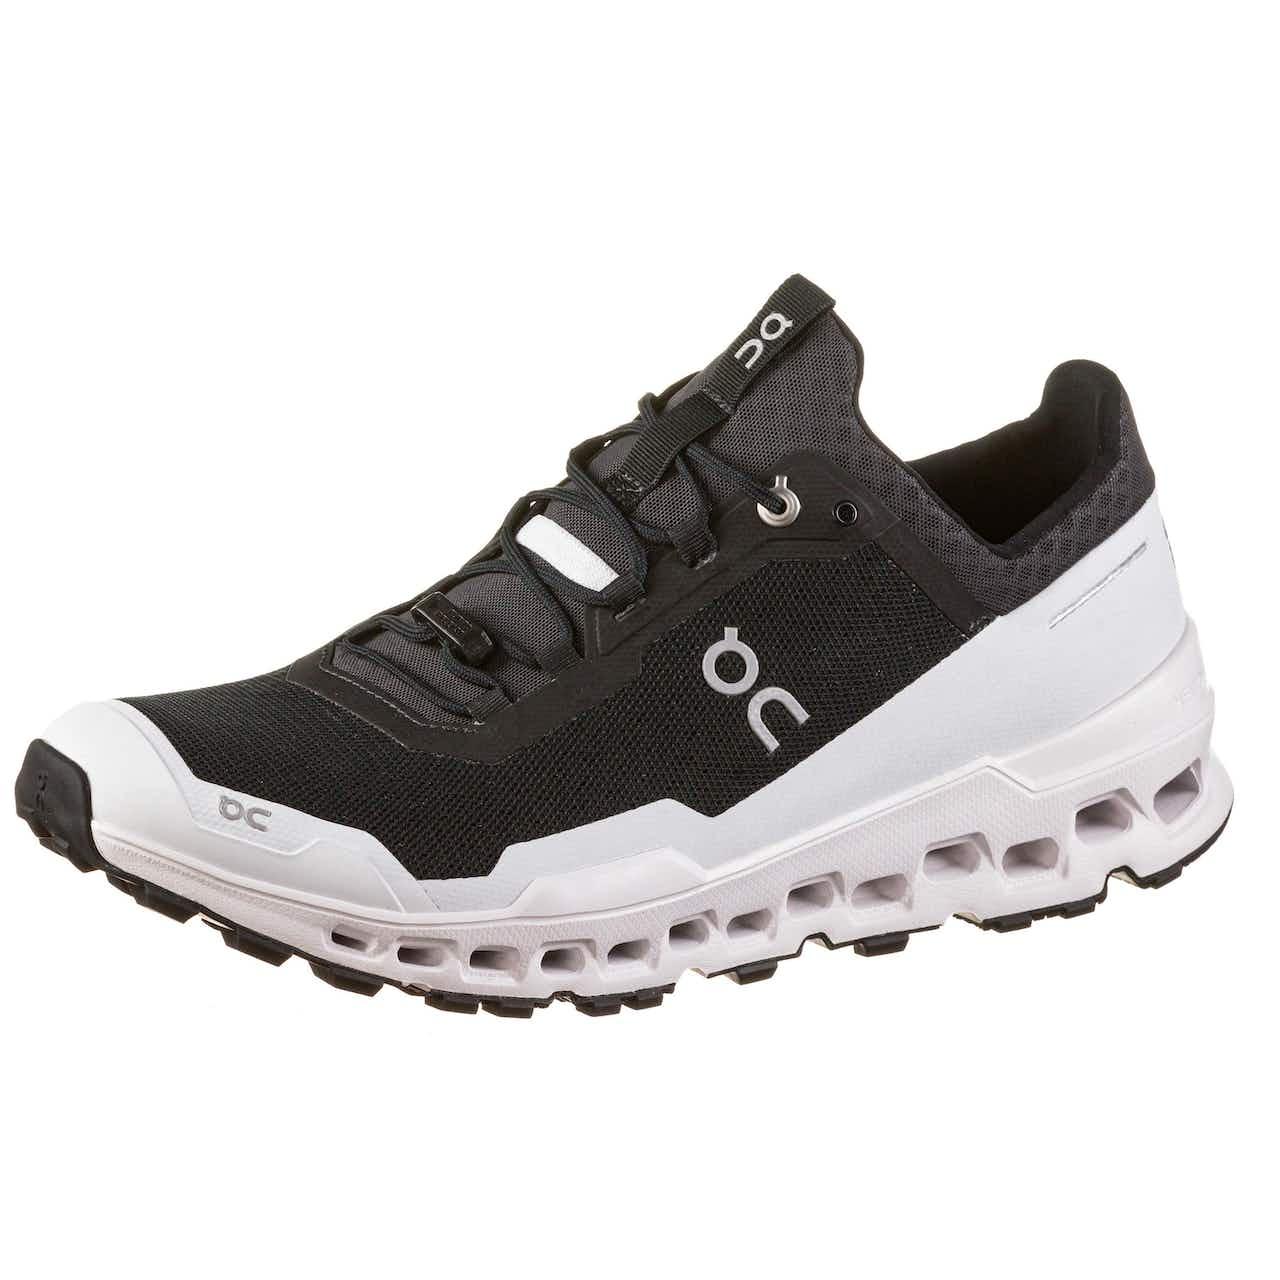 ON Cloudultra Trailrunning Schuhe Herren